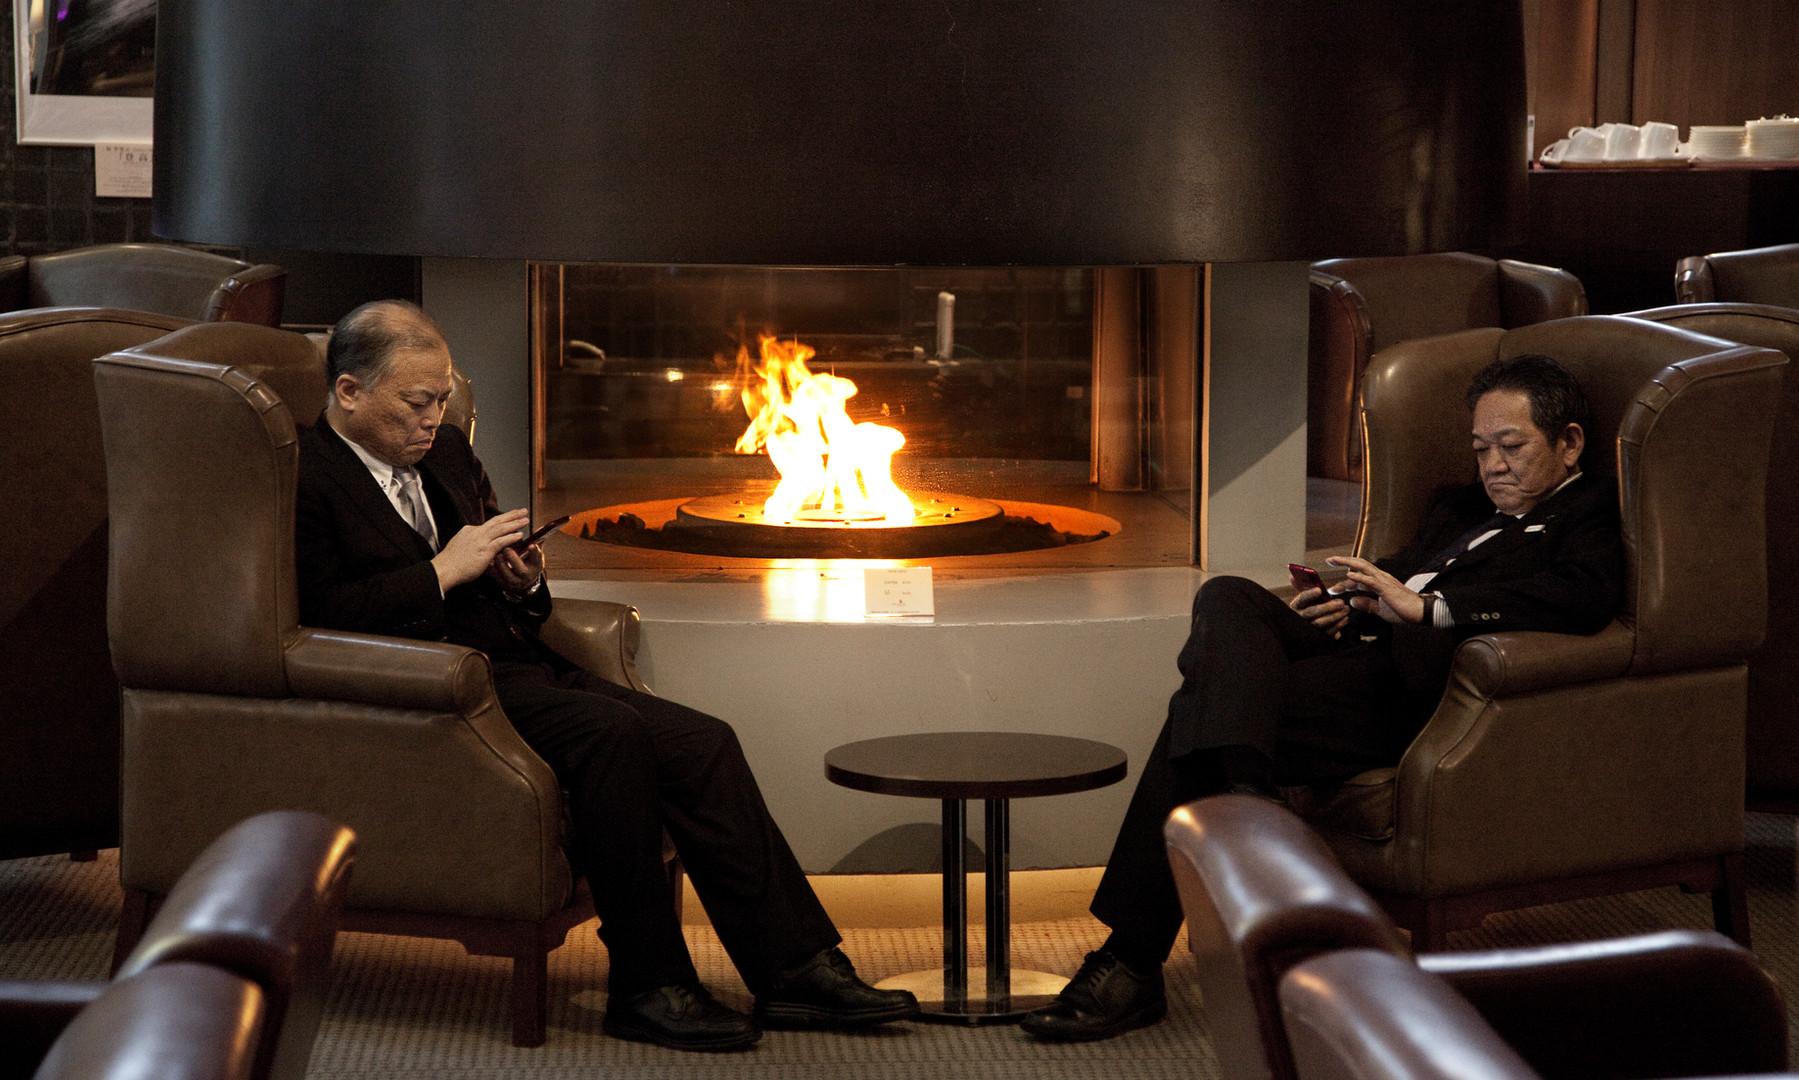 Business Men in Hotel Lobby